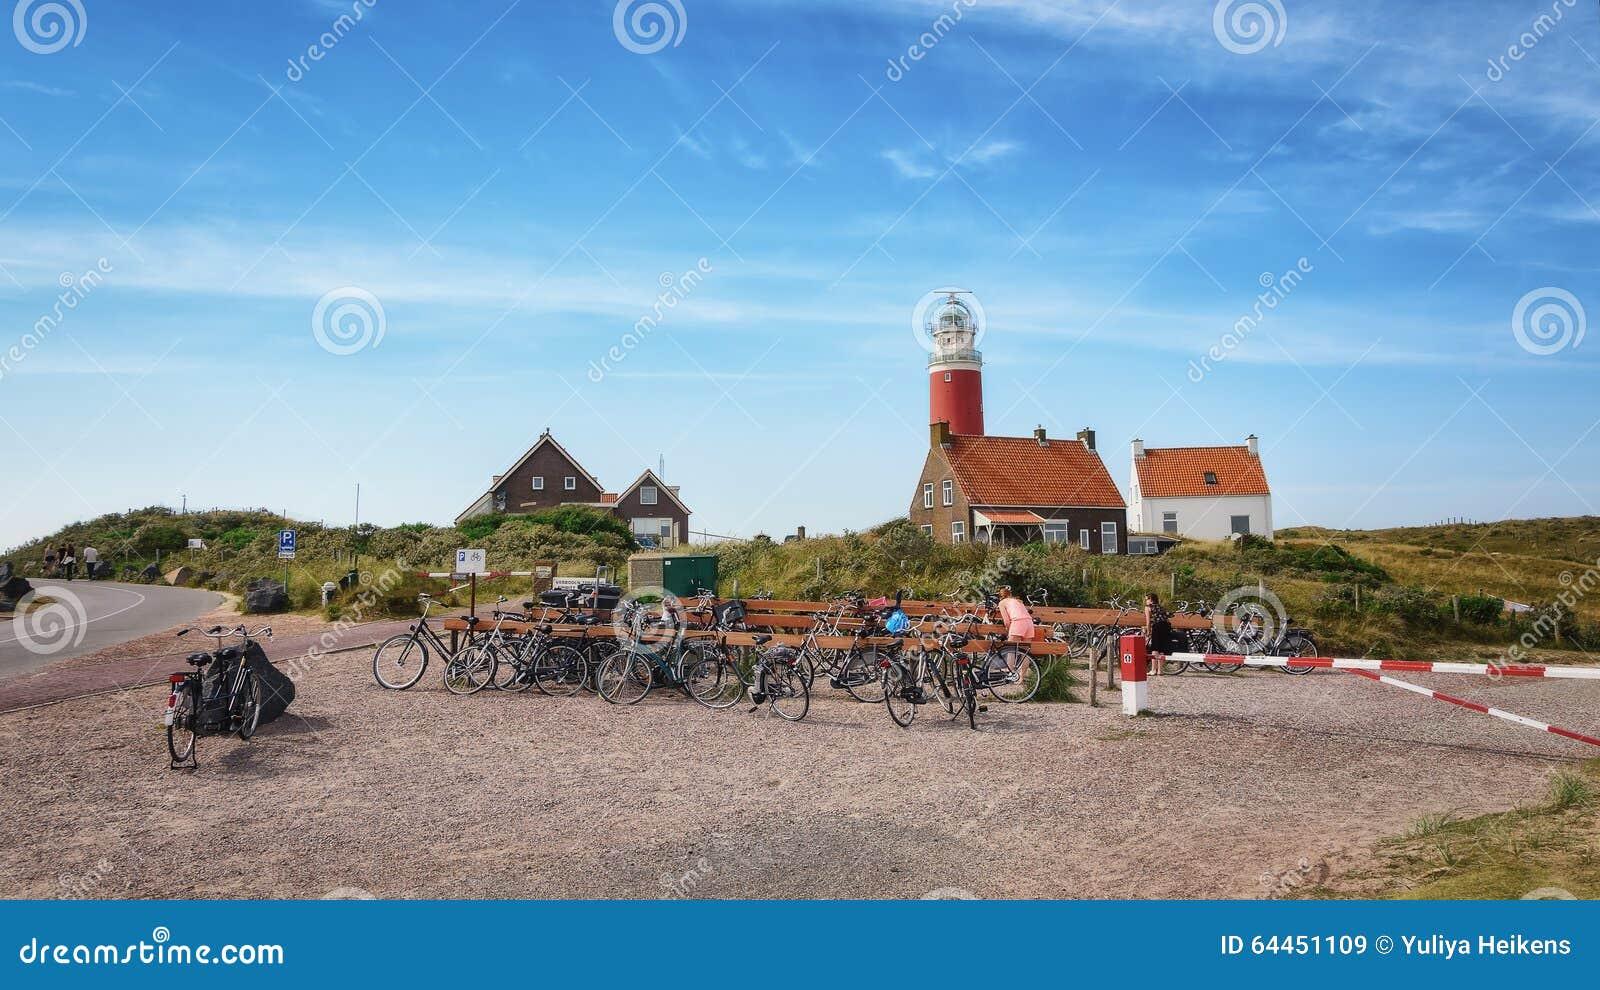 thumbs.dreamstime.com/z/leuchtturm-ein-symbol-des-...